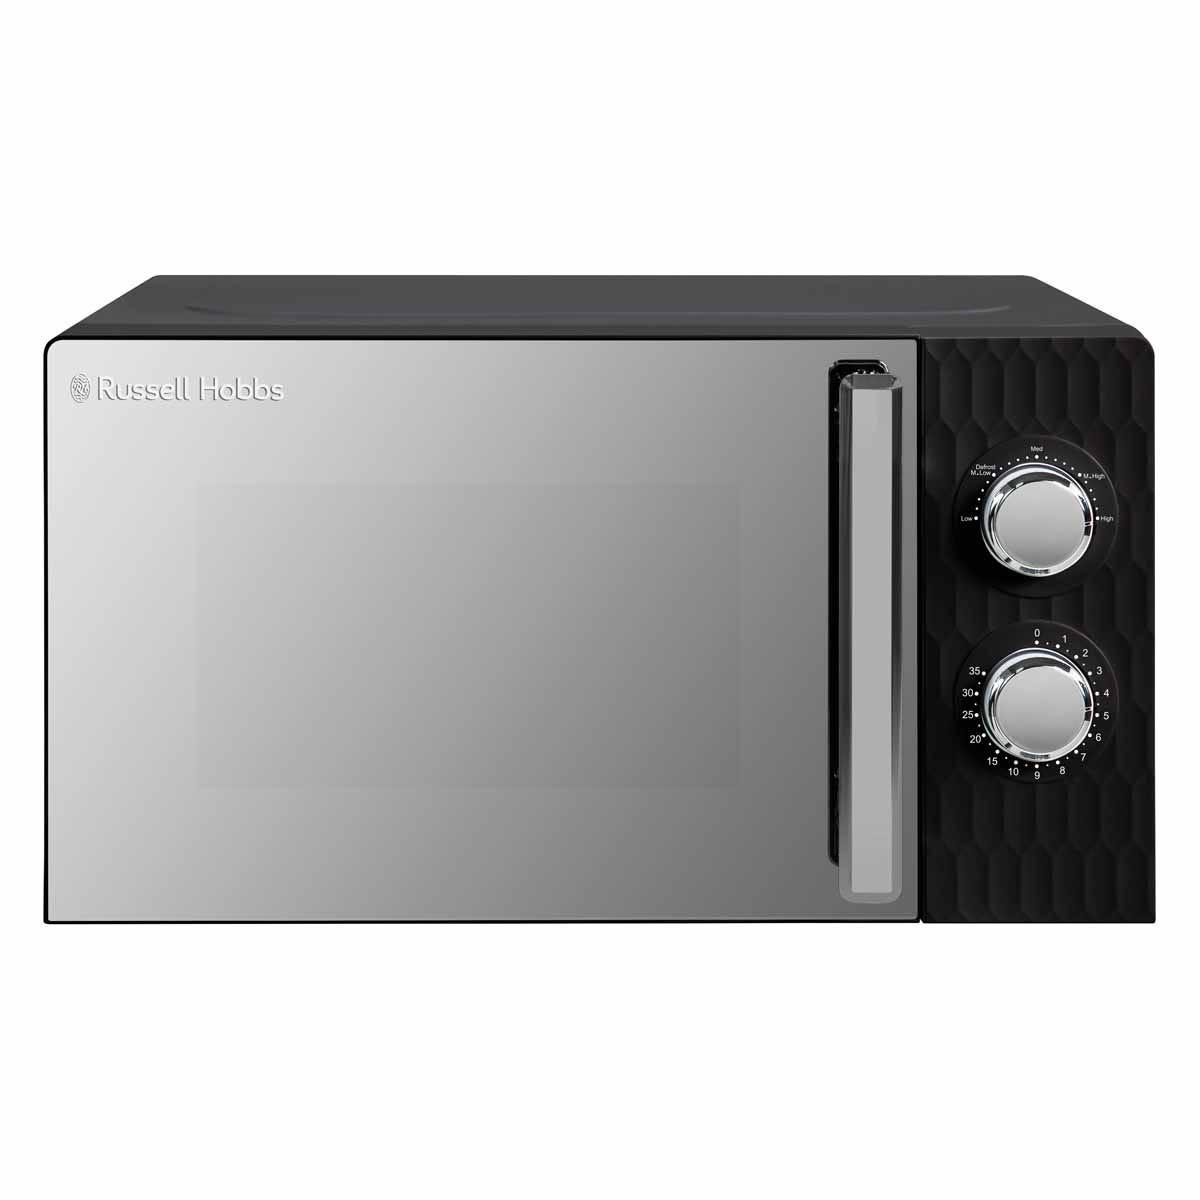 Russell Hobbs RHMMM715B Honeycomb 17L 700W Manual Microwave - Black